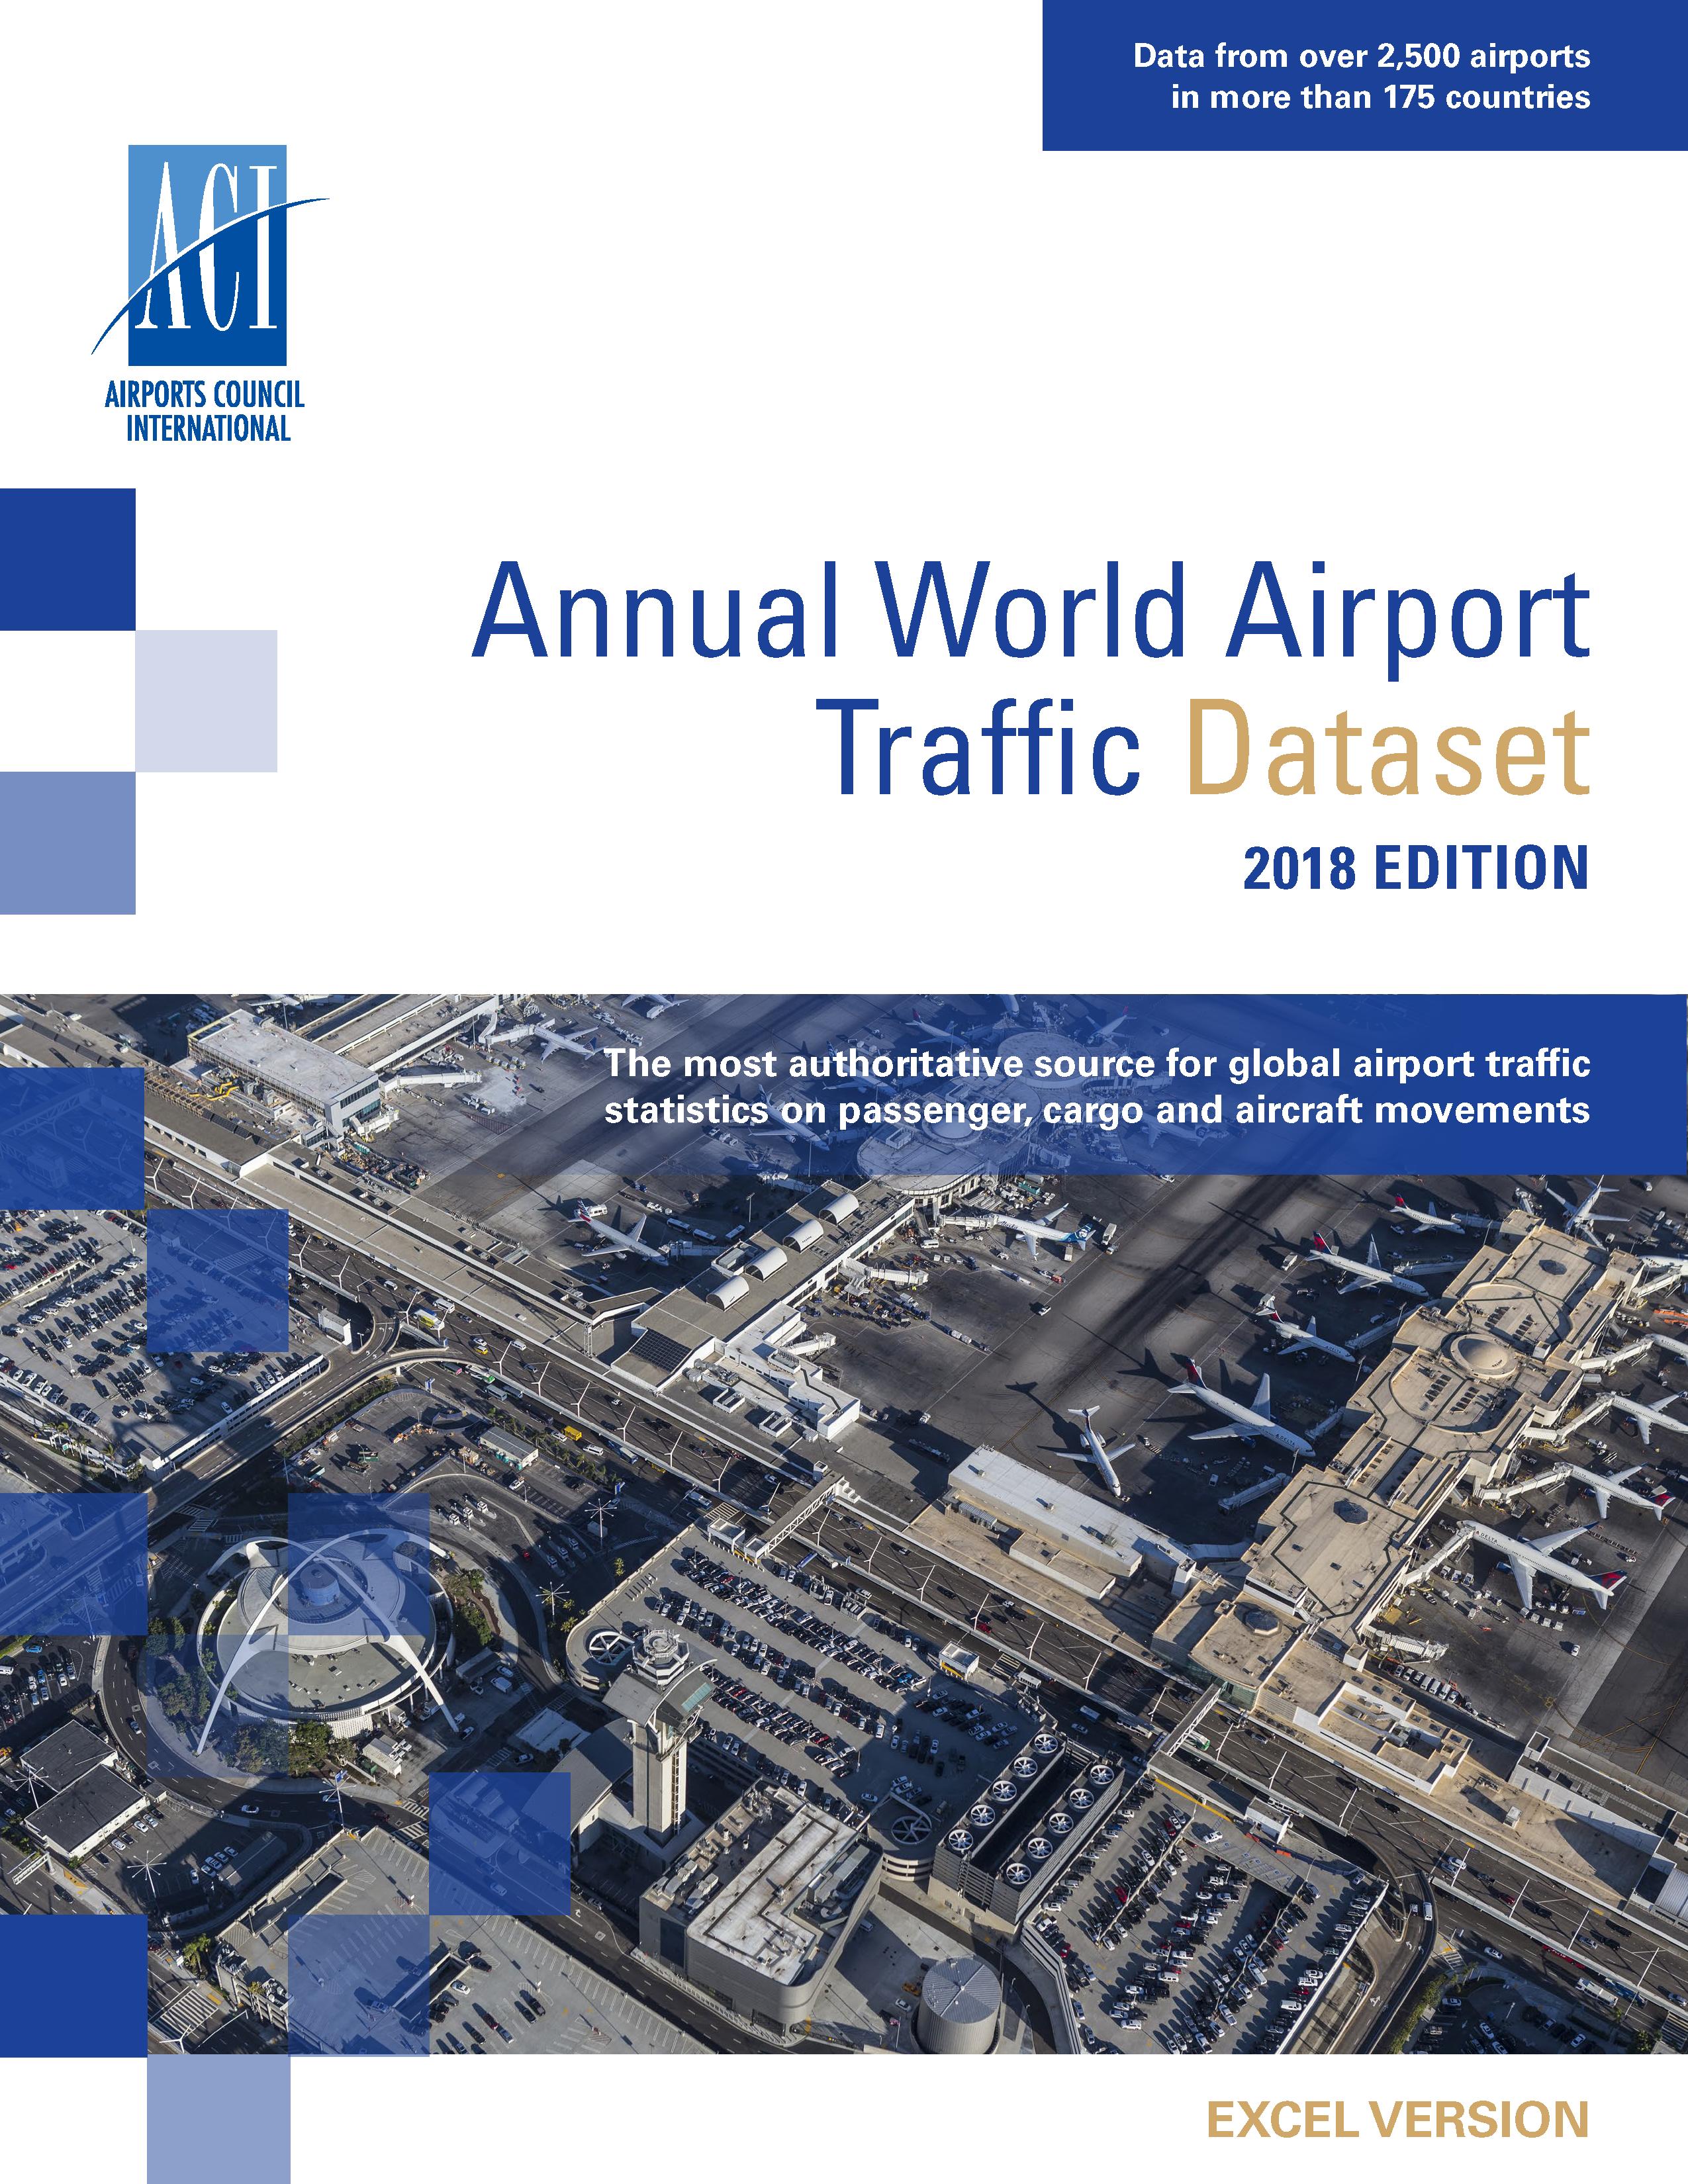 Annual World Airport Traffic Dataset, 2018